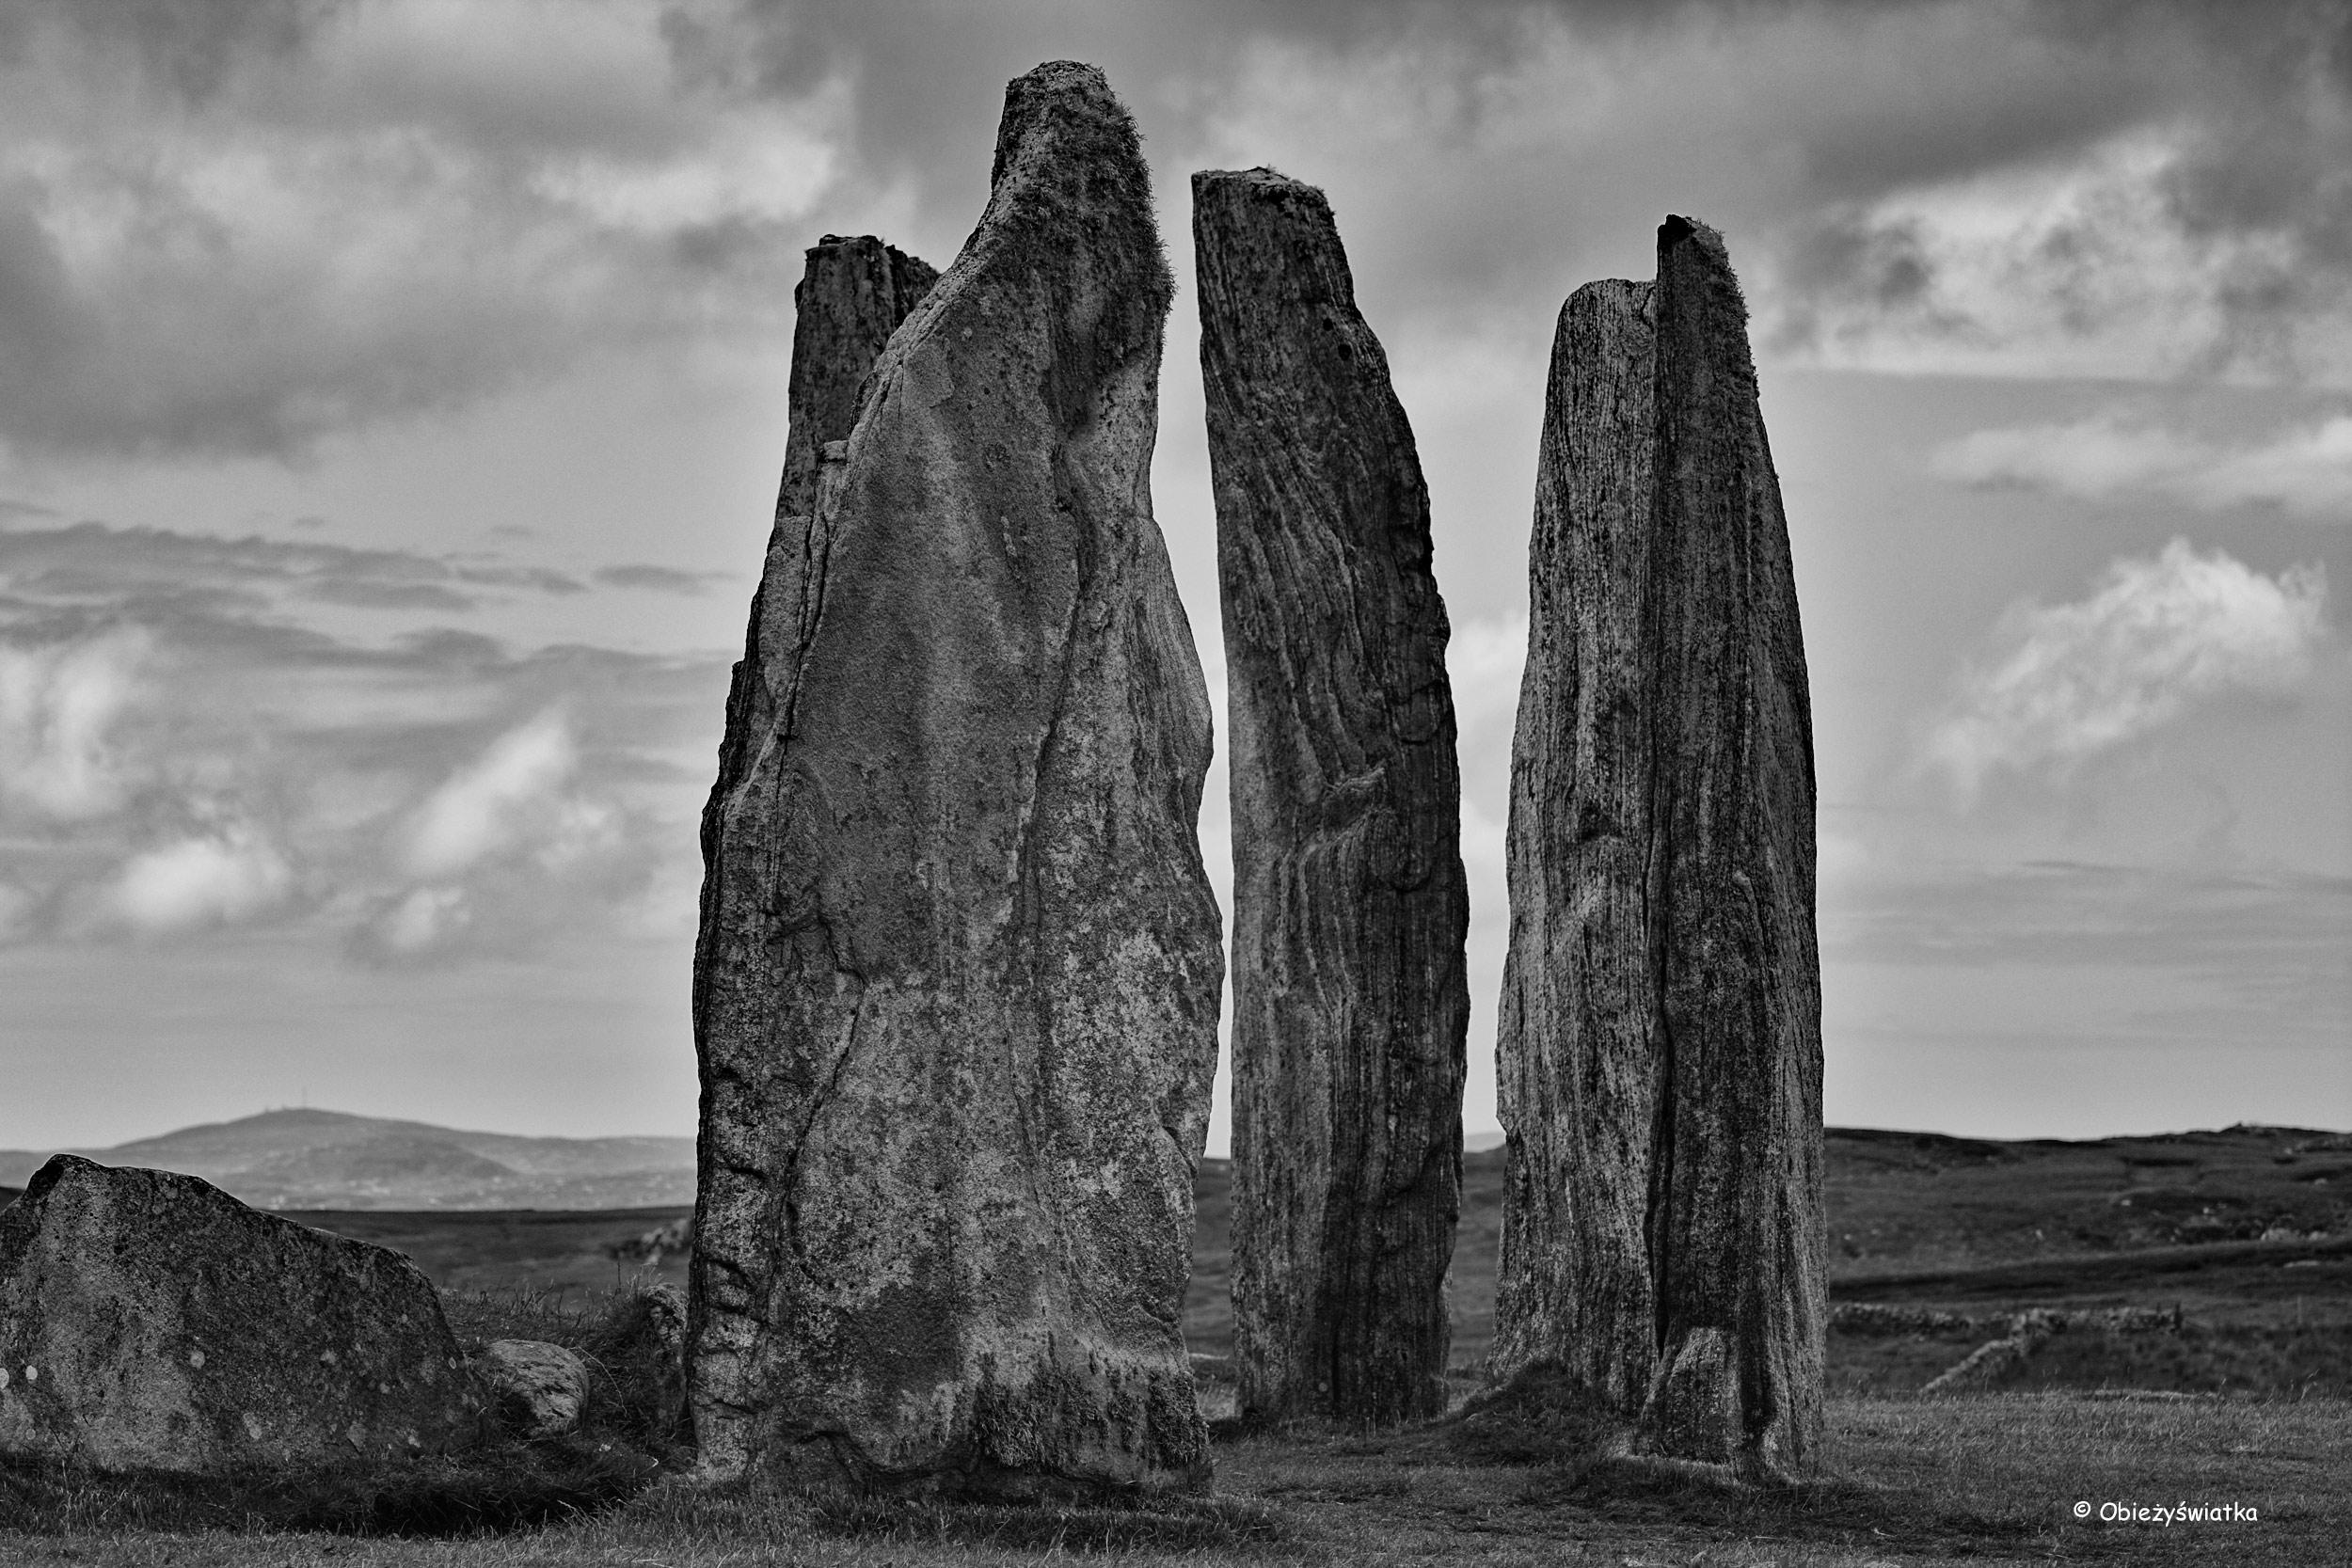 Tajemnicze megality w Callanish/Calanais, Szkocja, Lewis and Harris